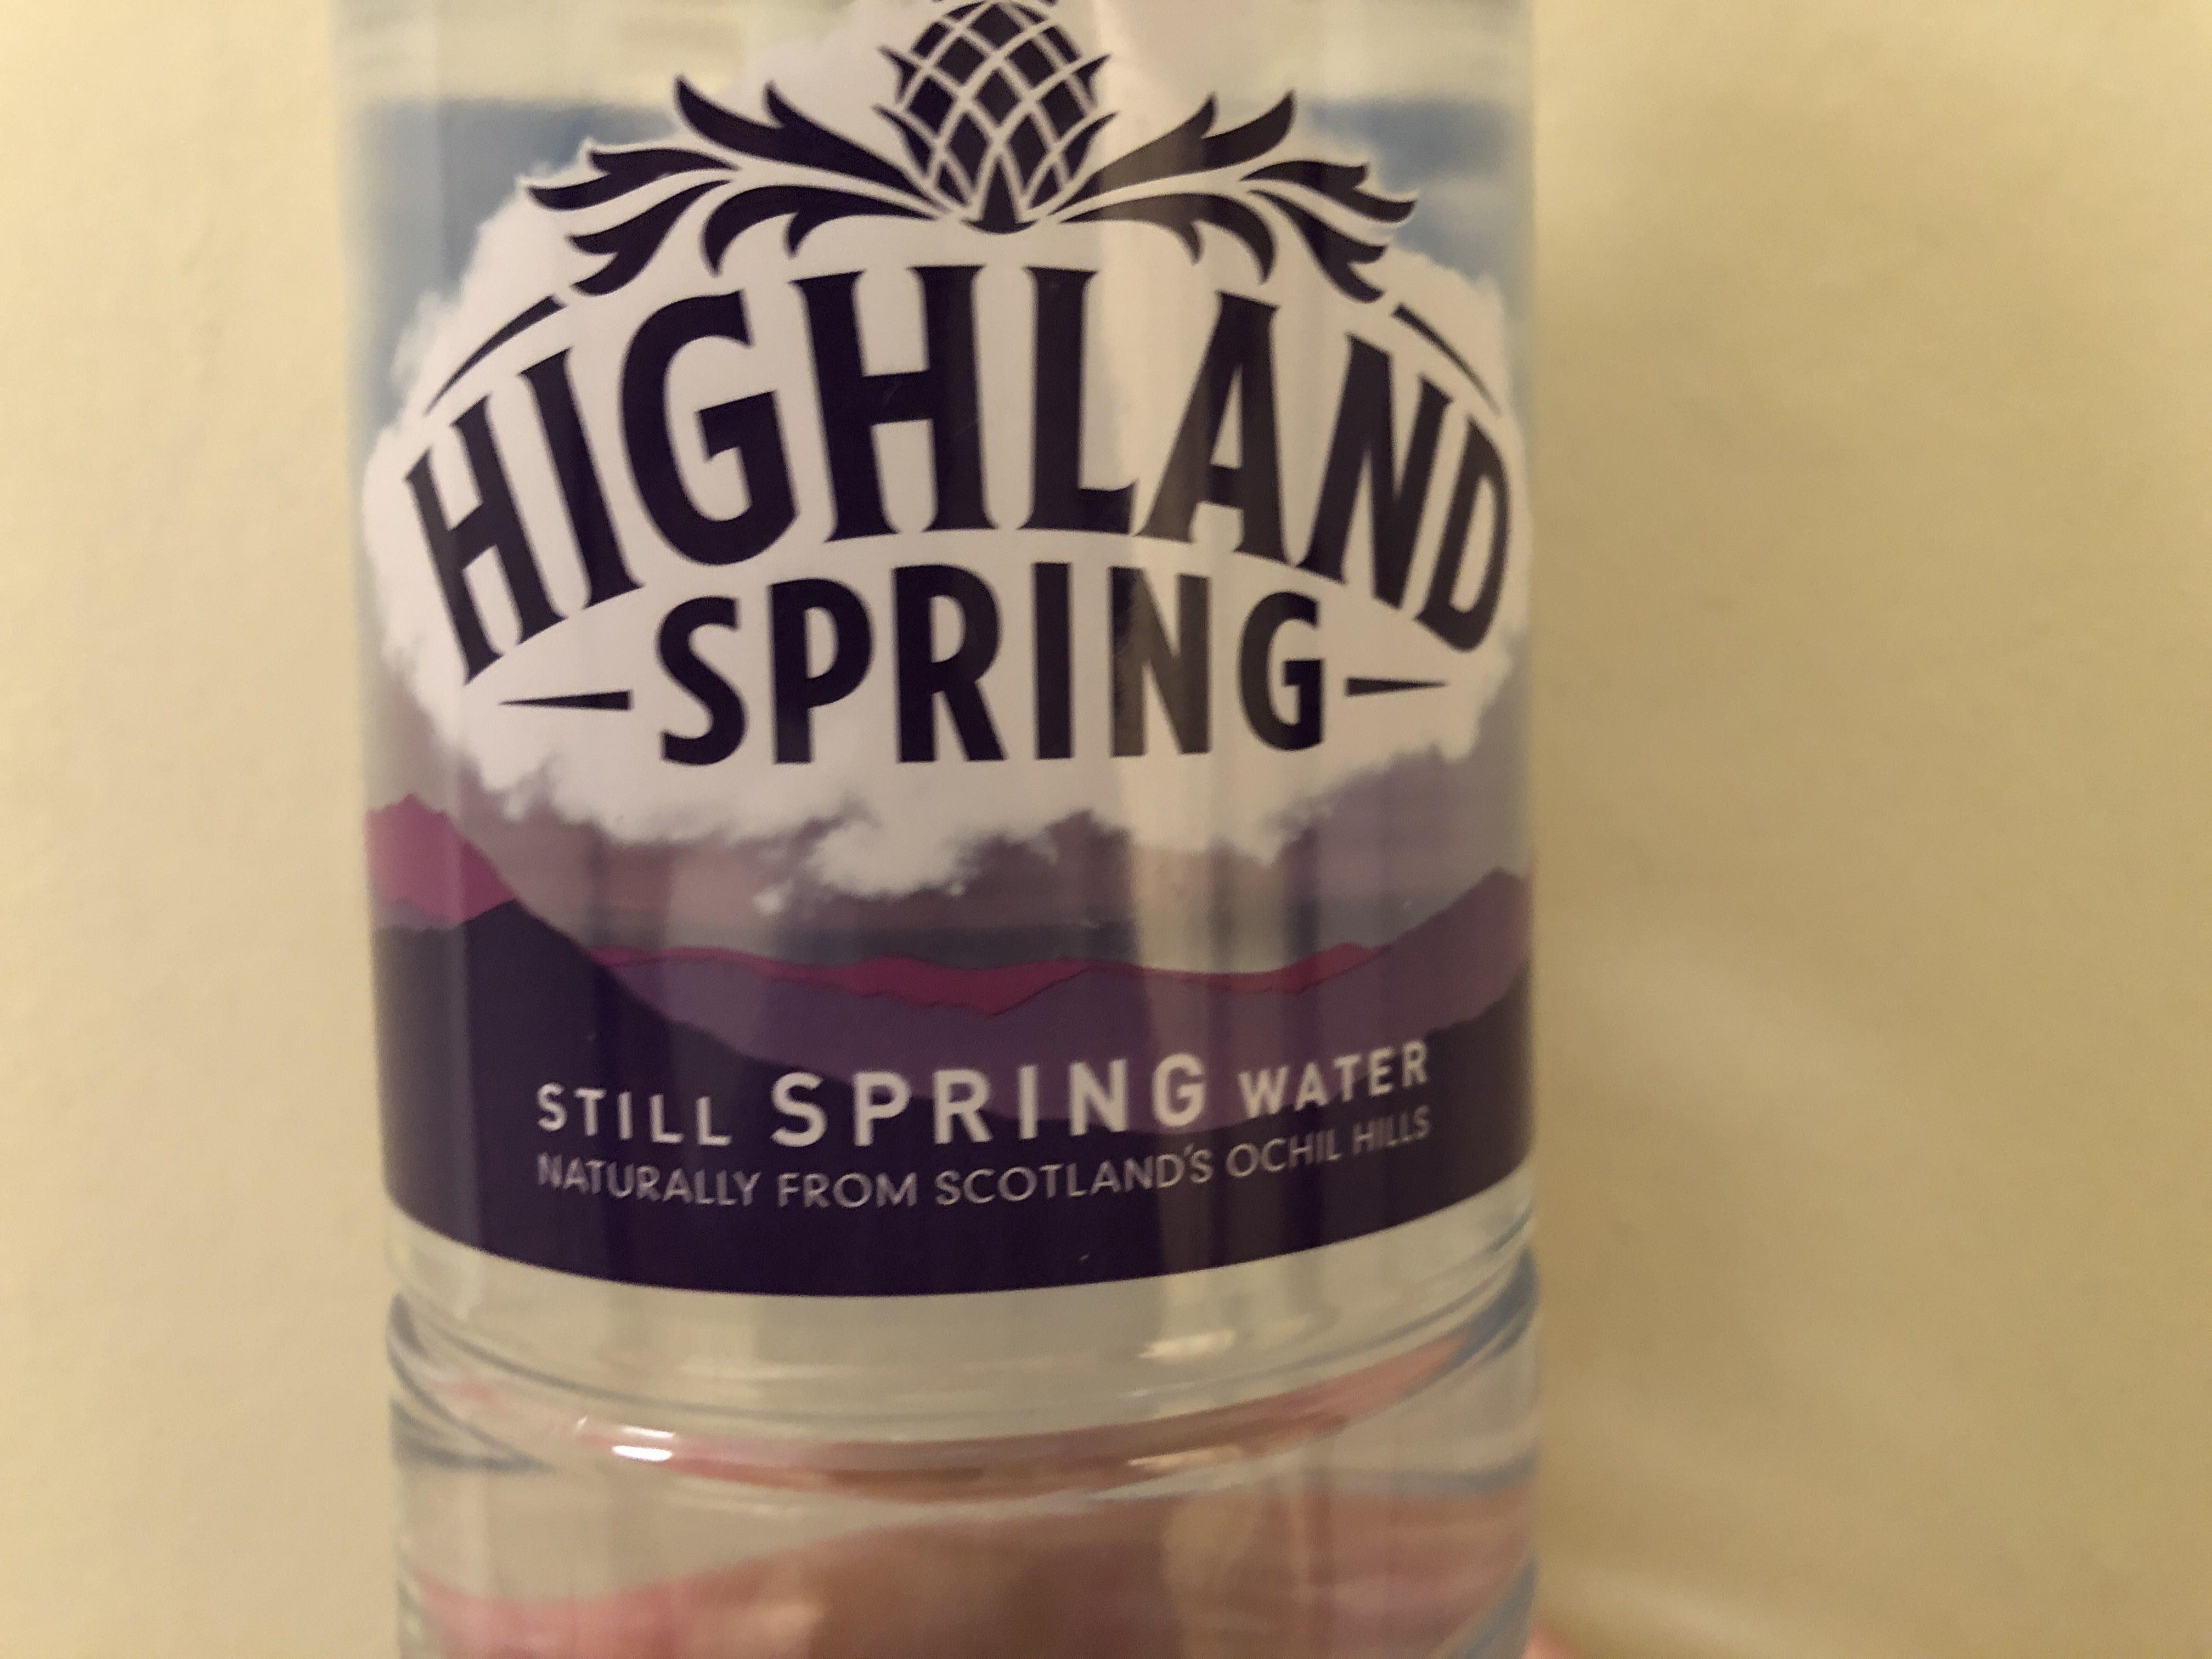 Highland spring still spring water - Product